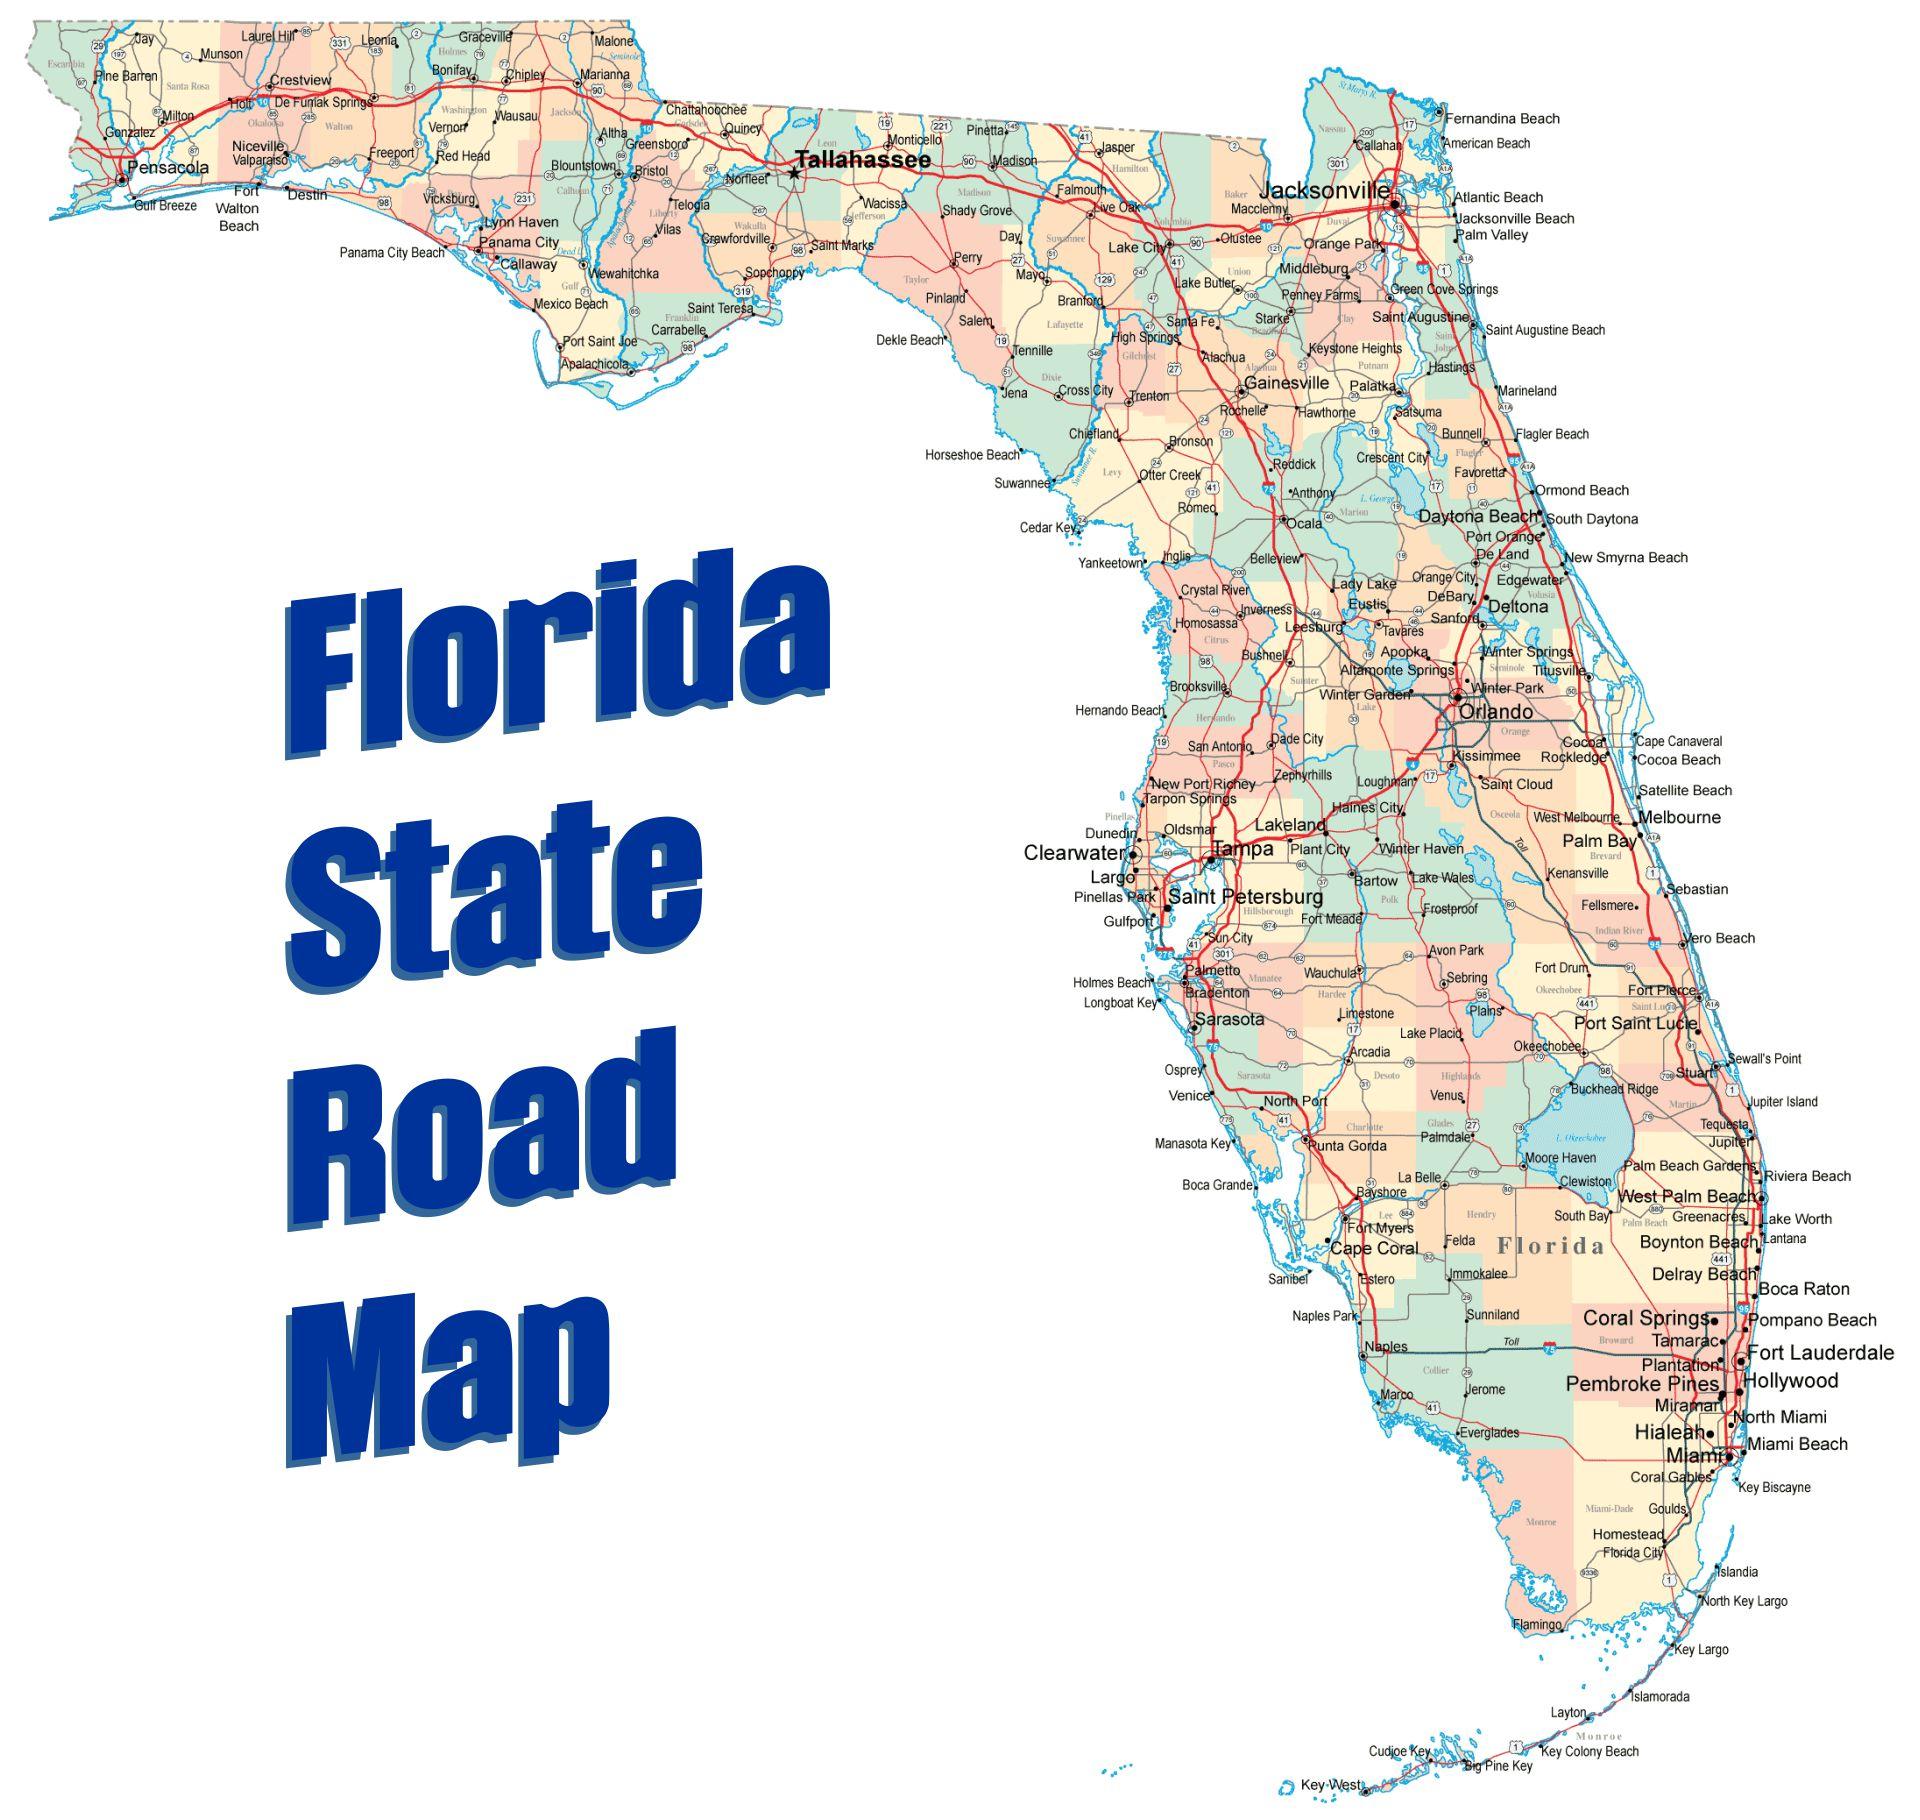 Florida State Road Map